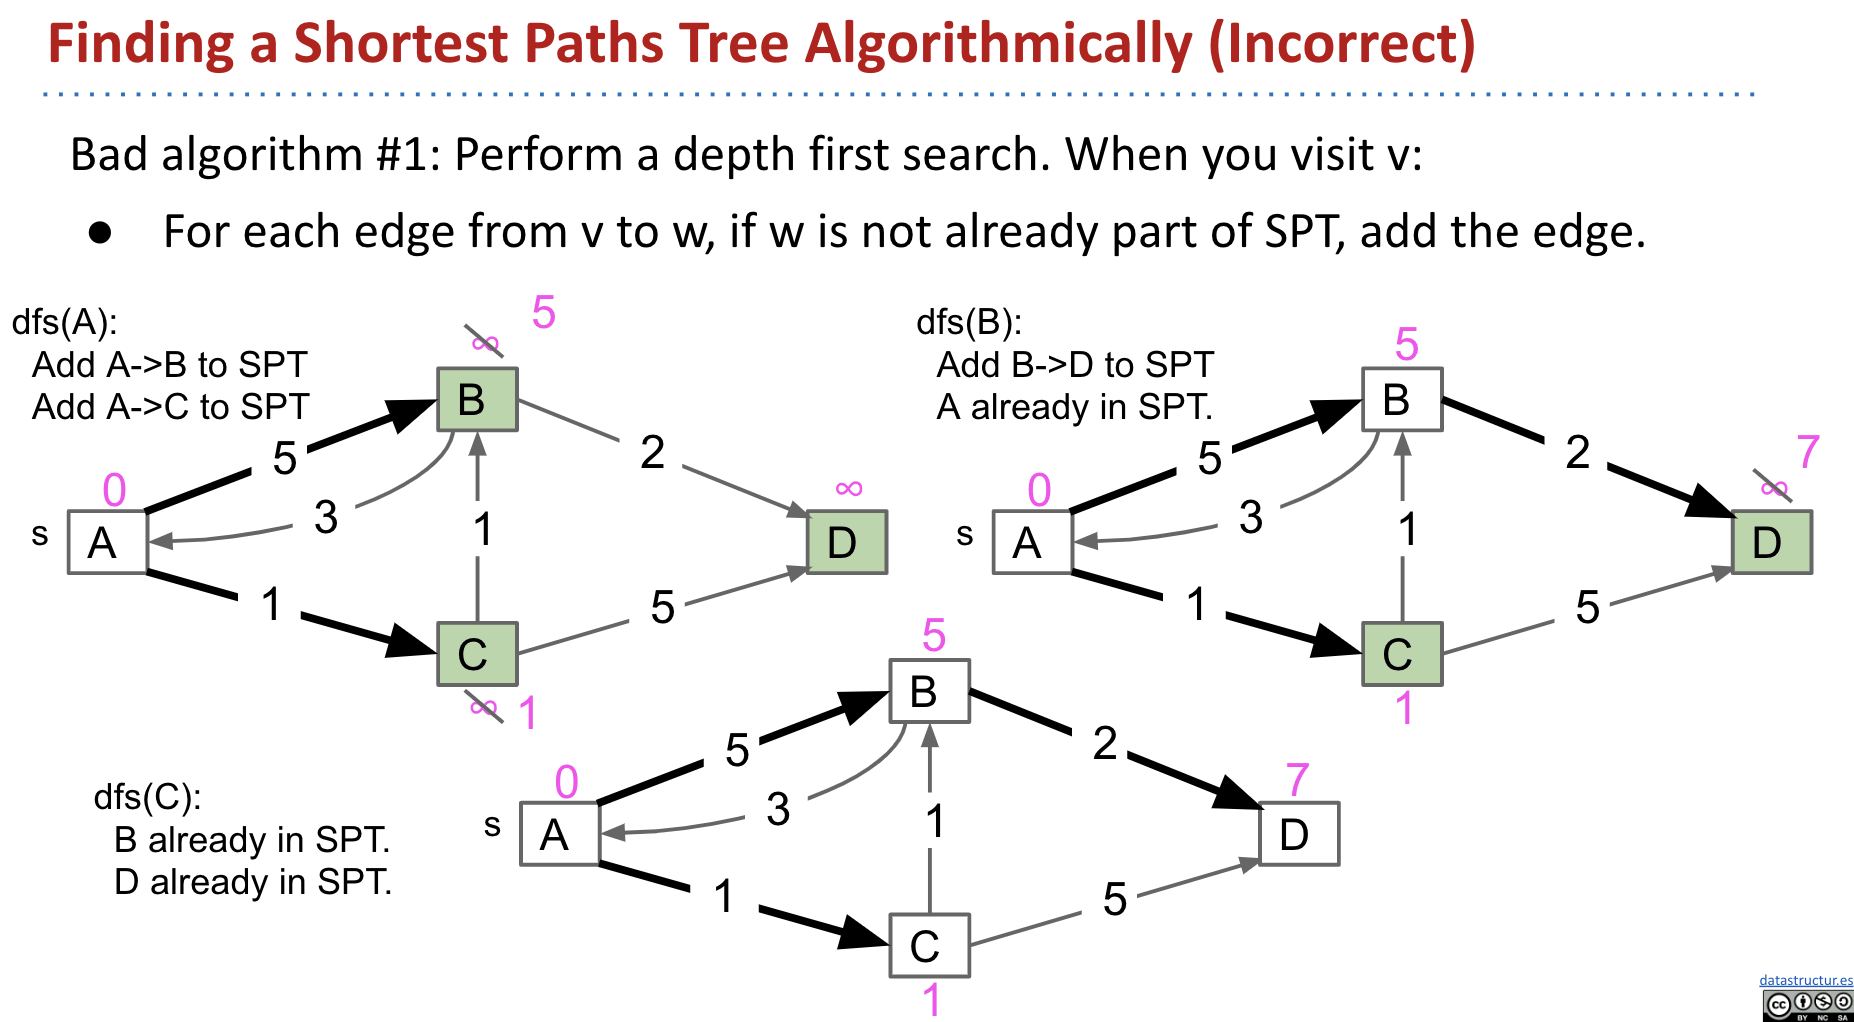 Bad Algorithm #1